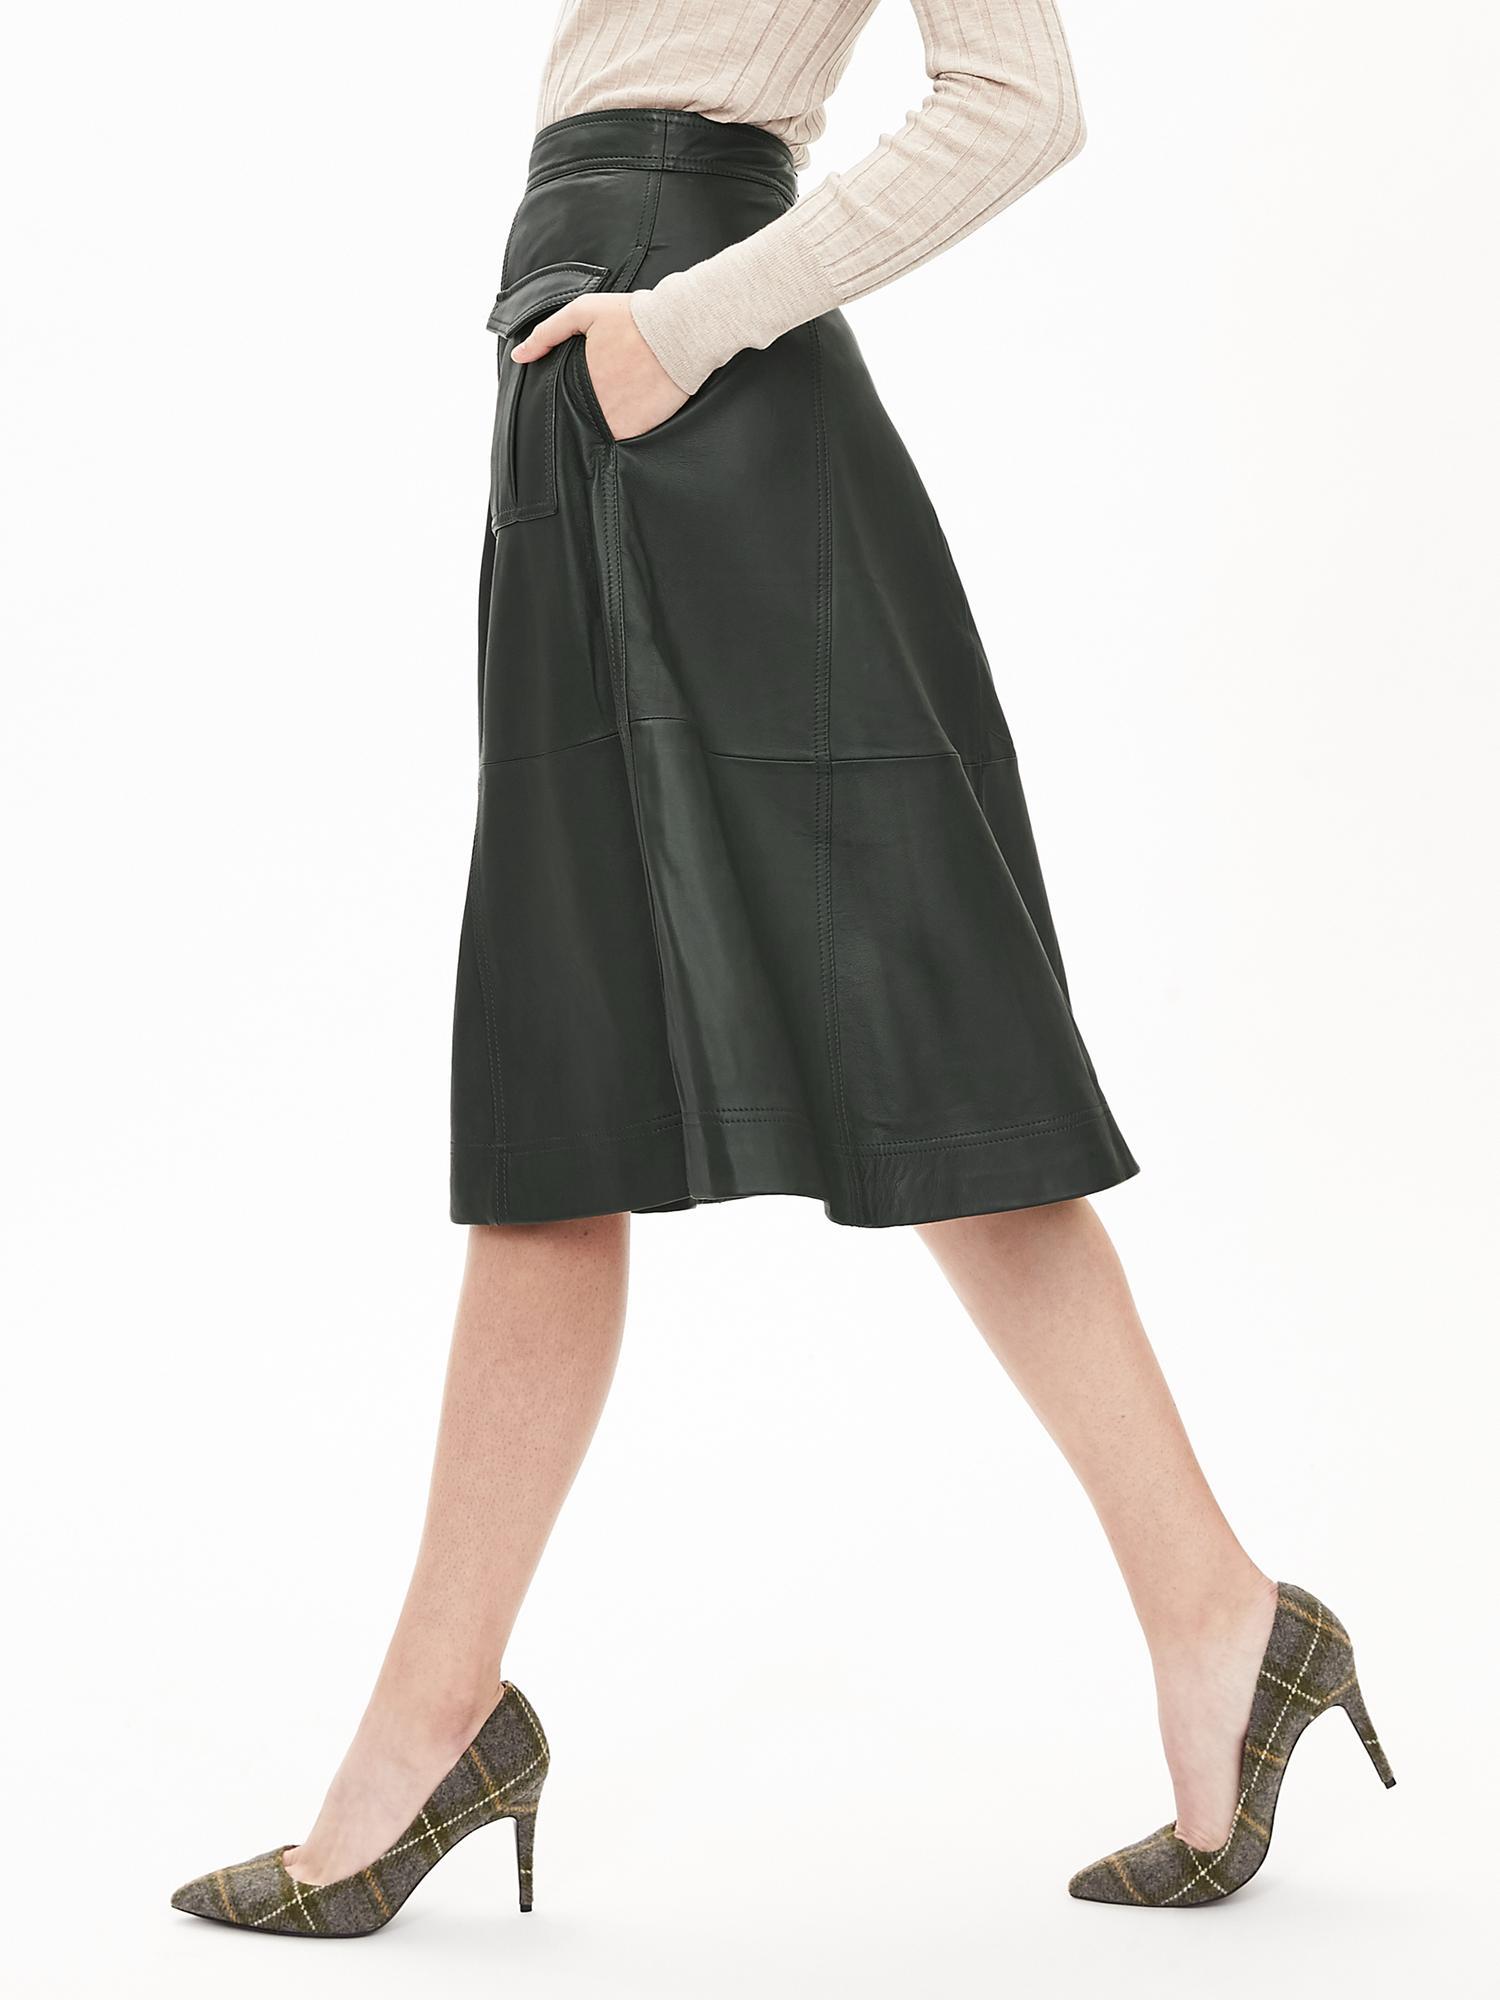 e8089404b2 Banana Republic Heritage Leather Cargo Midi Skirt in Green - Lyst